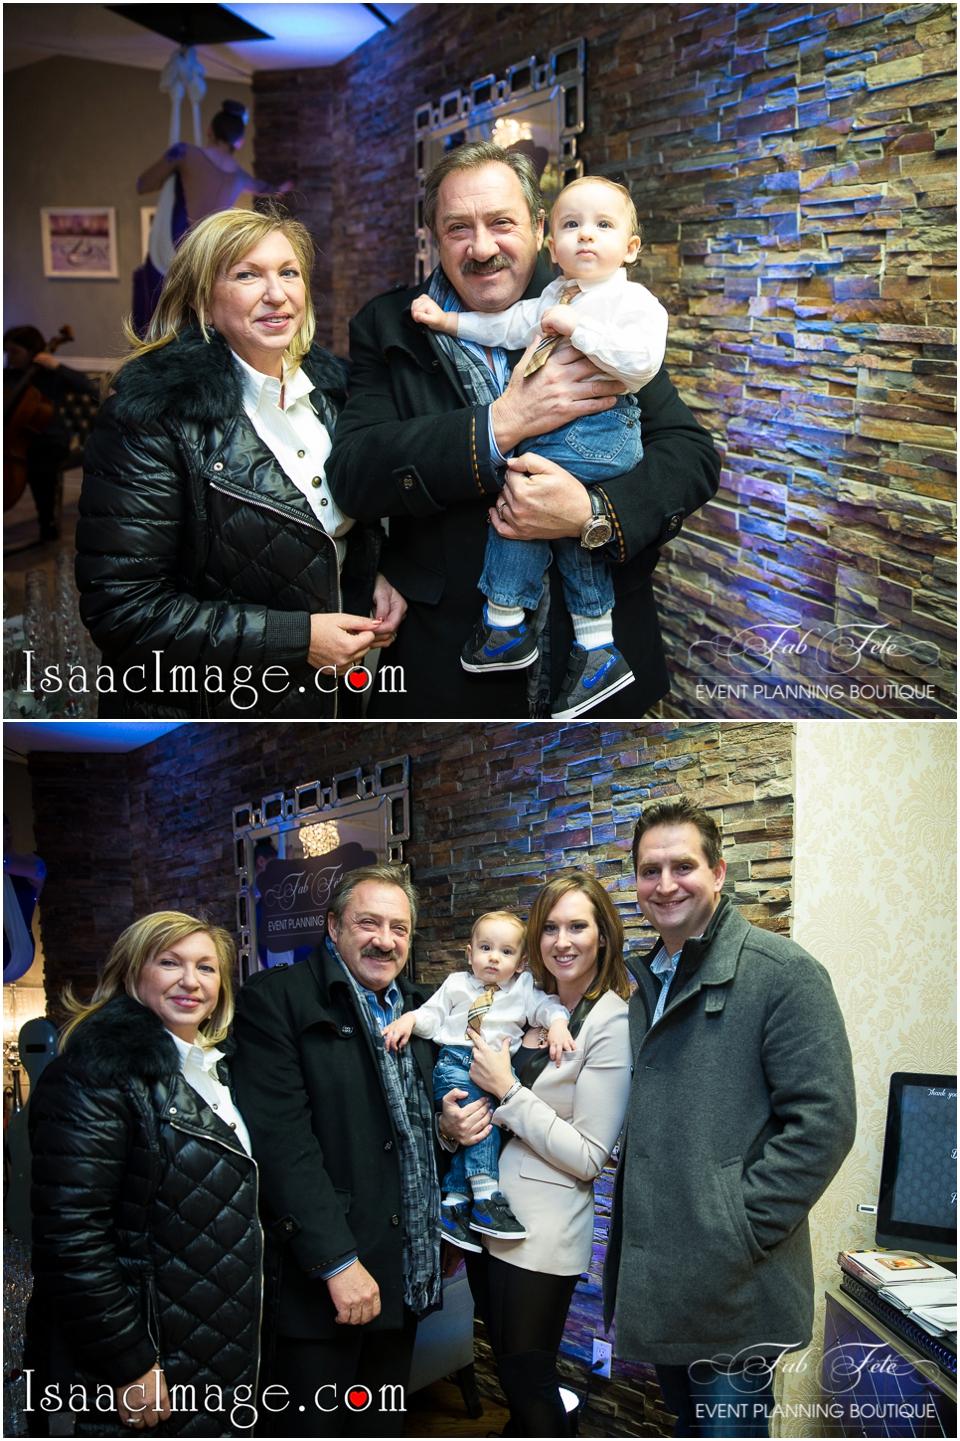 Fab Fete Toronto Wedding Event Planning Boutique open house_6471.jpg